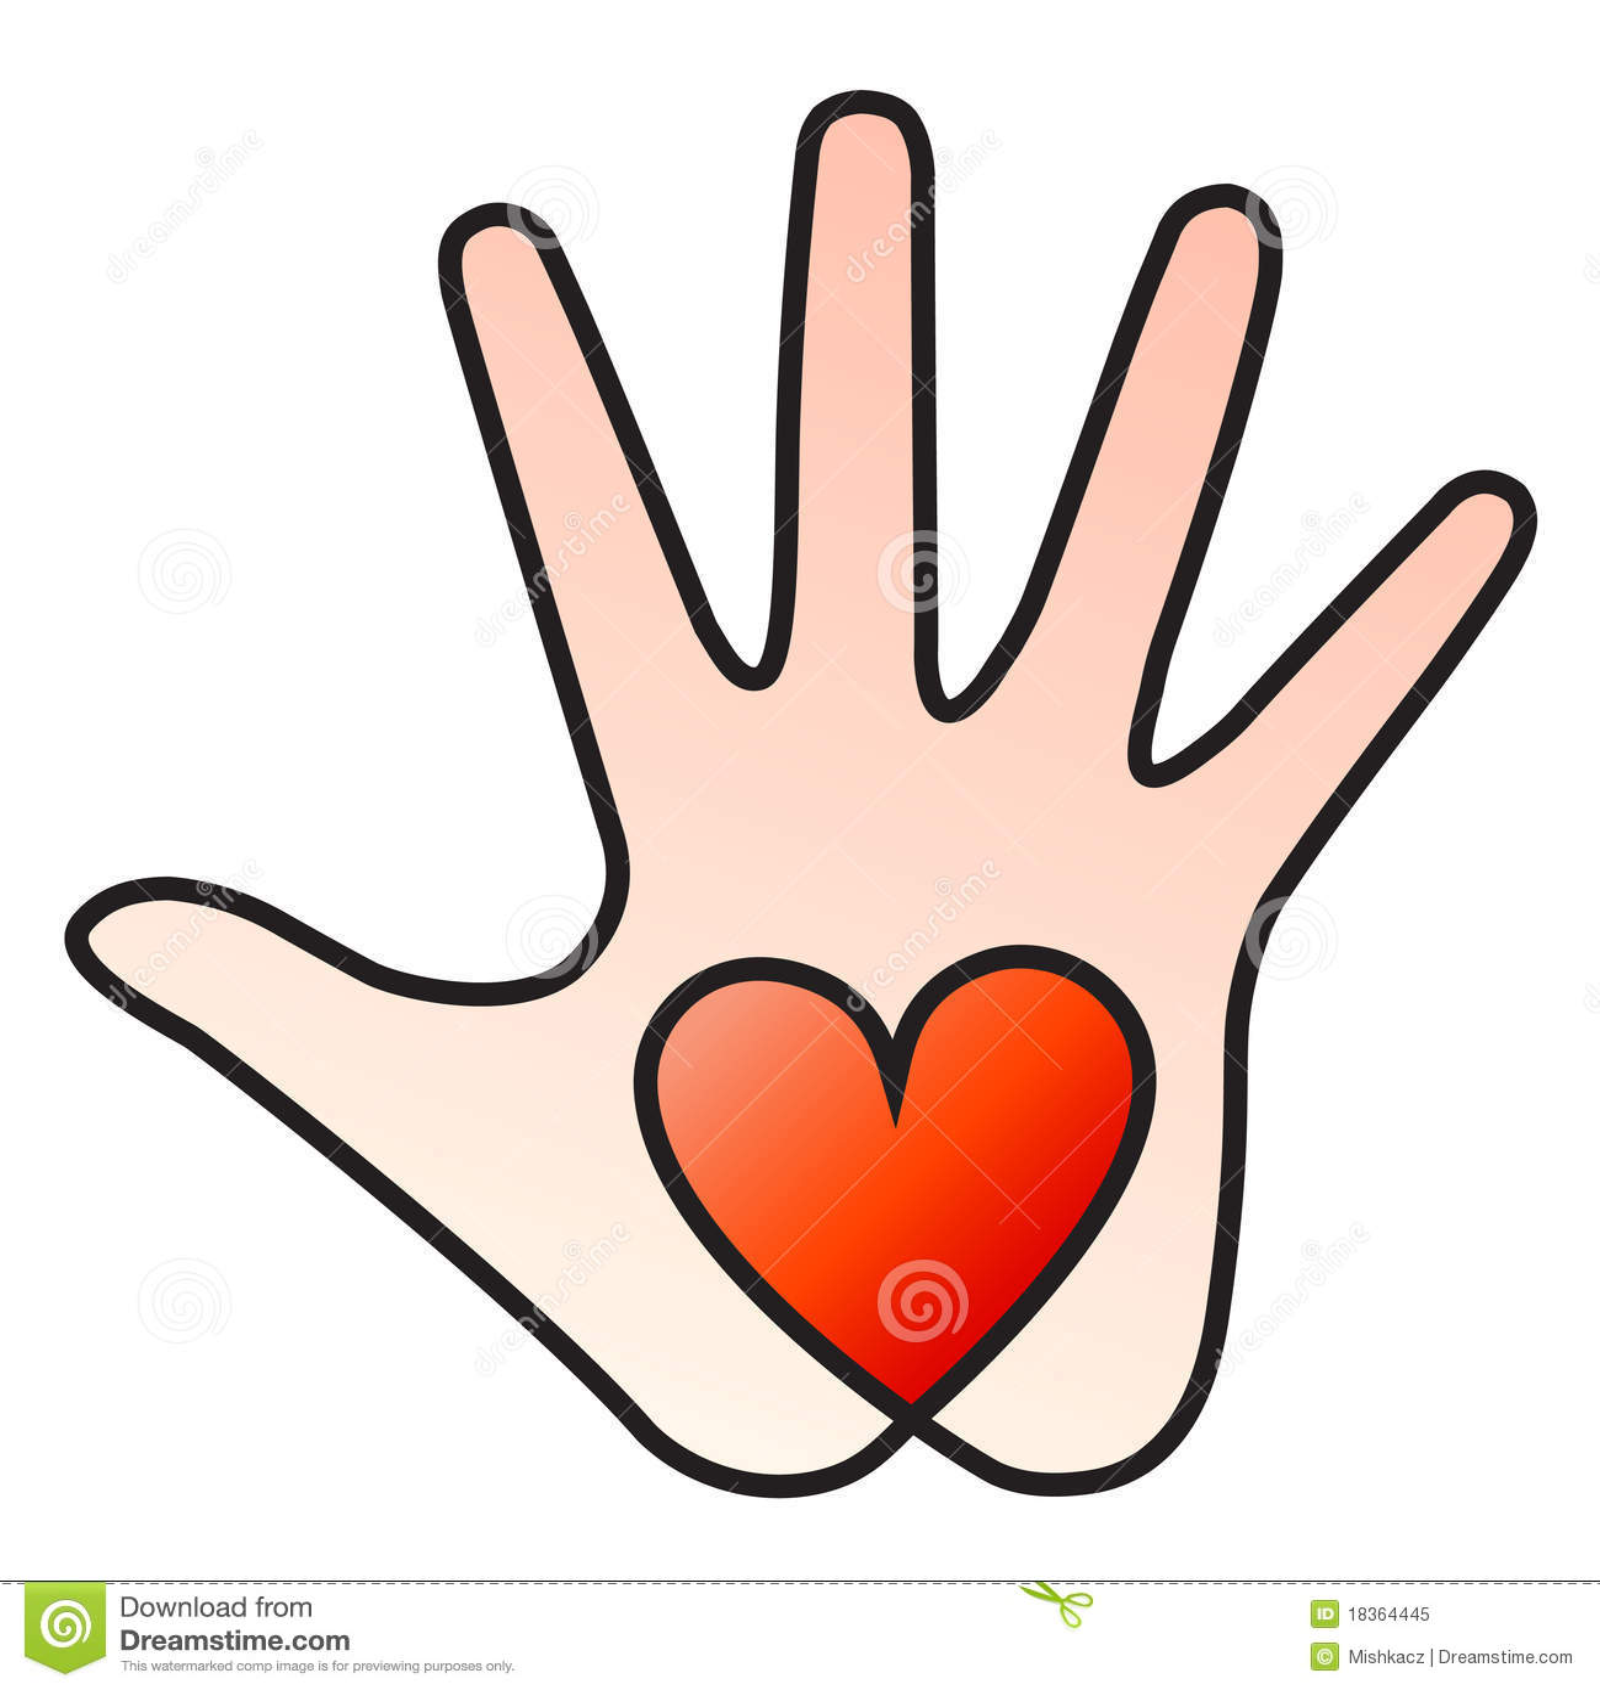 heart hand royalty free stock photo image 18364445